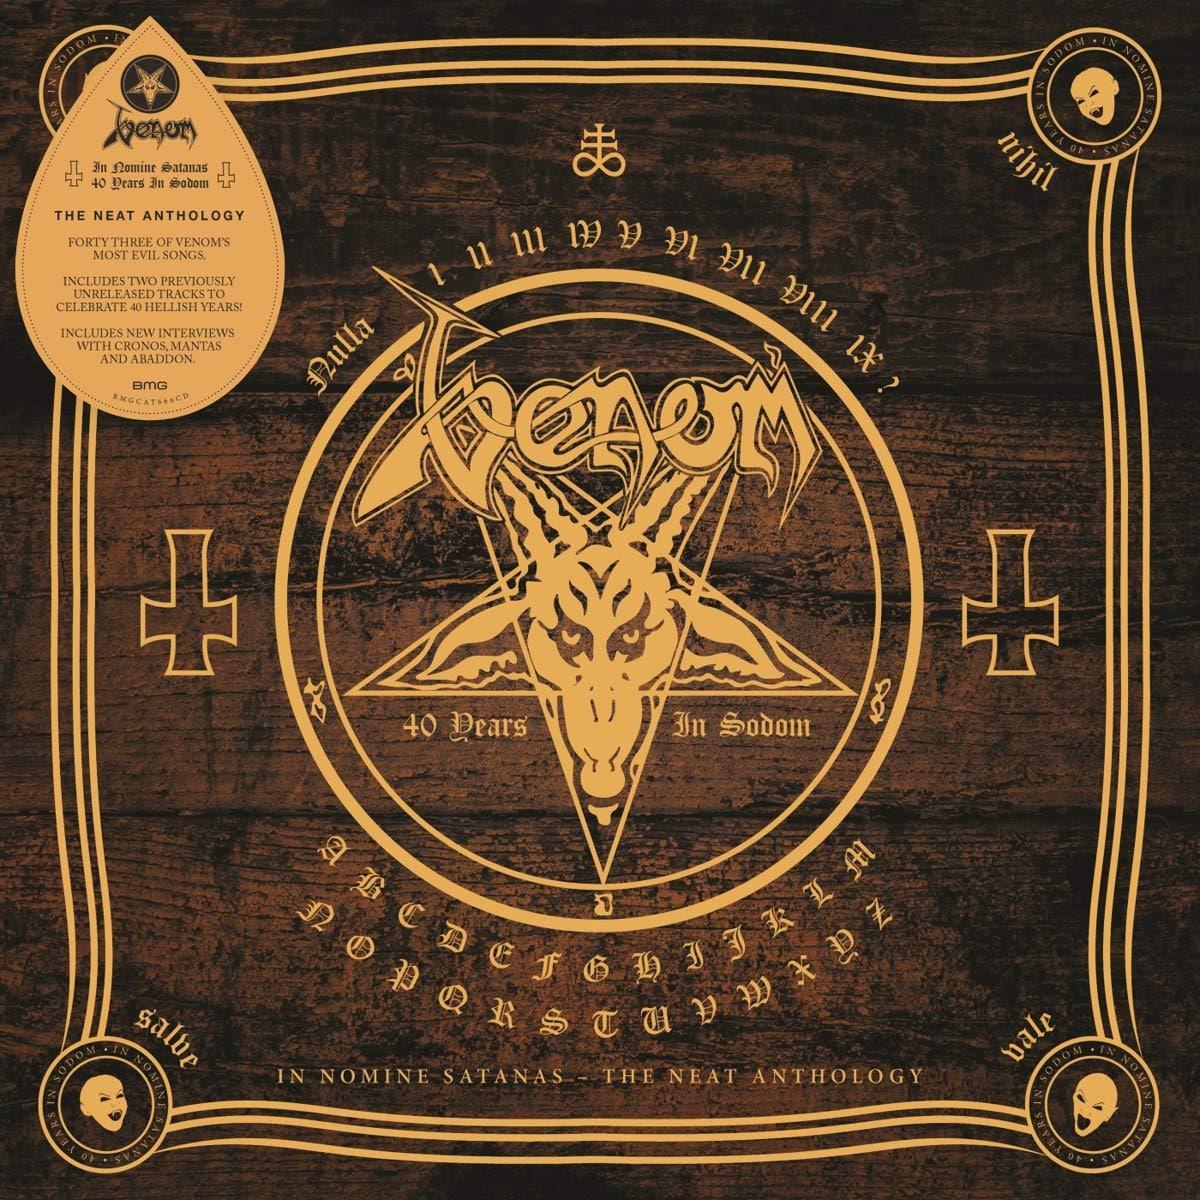 Venom - 'In Nomine Satanas (The Neat Anthology)'